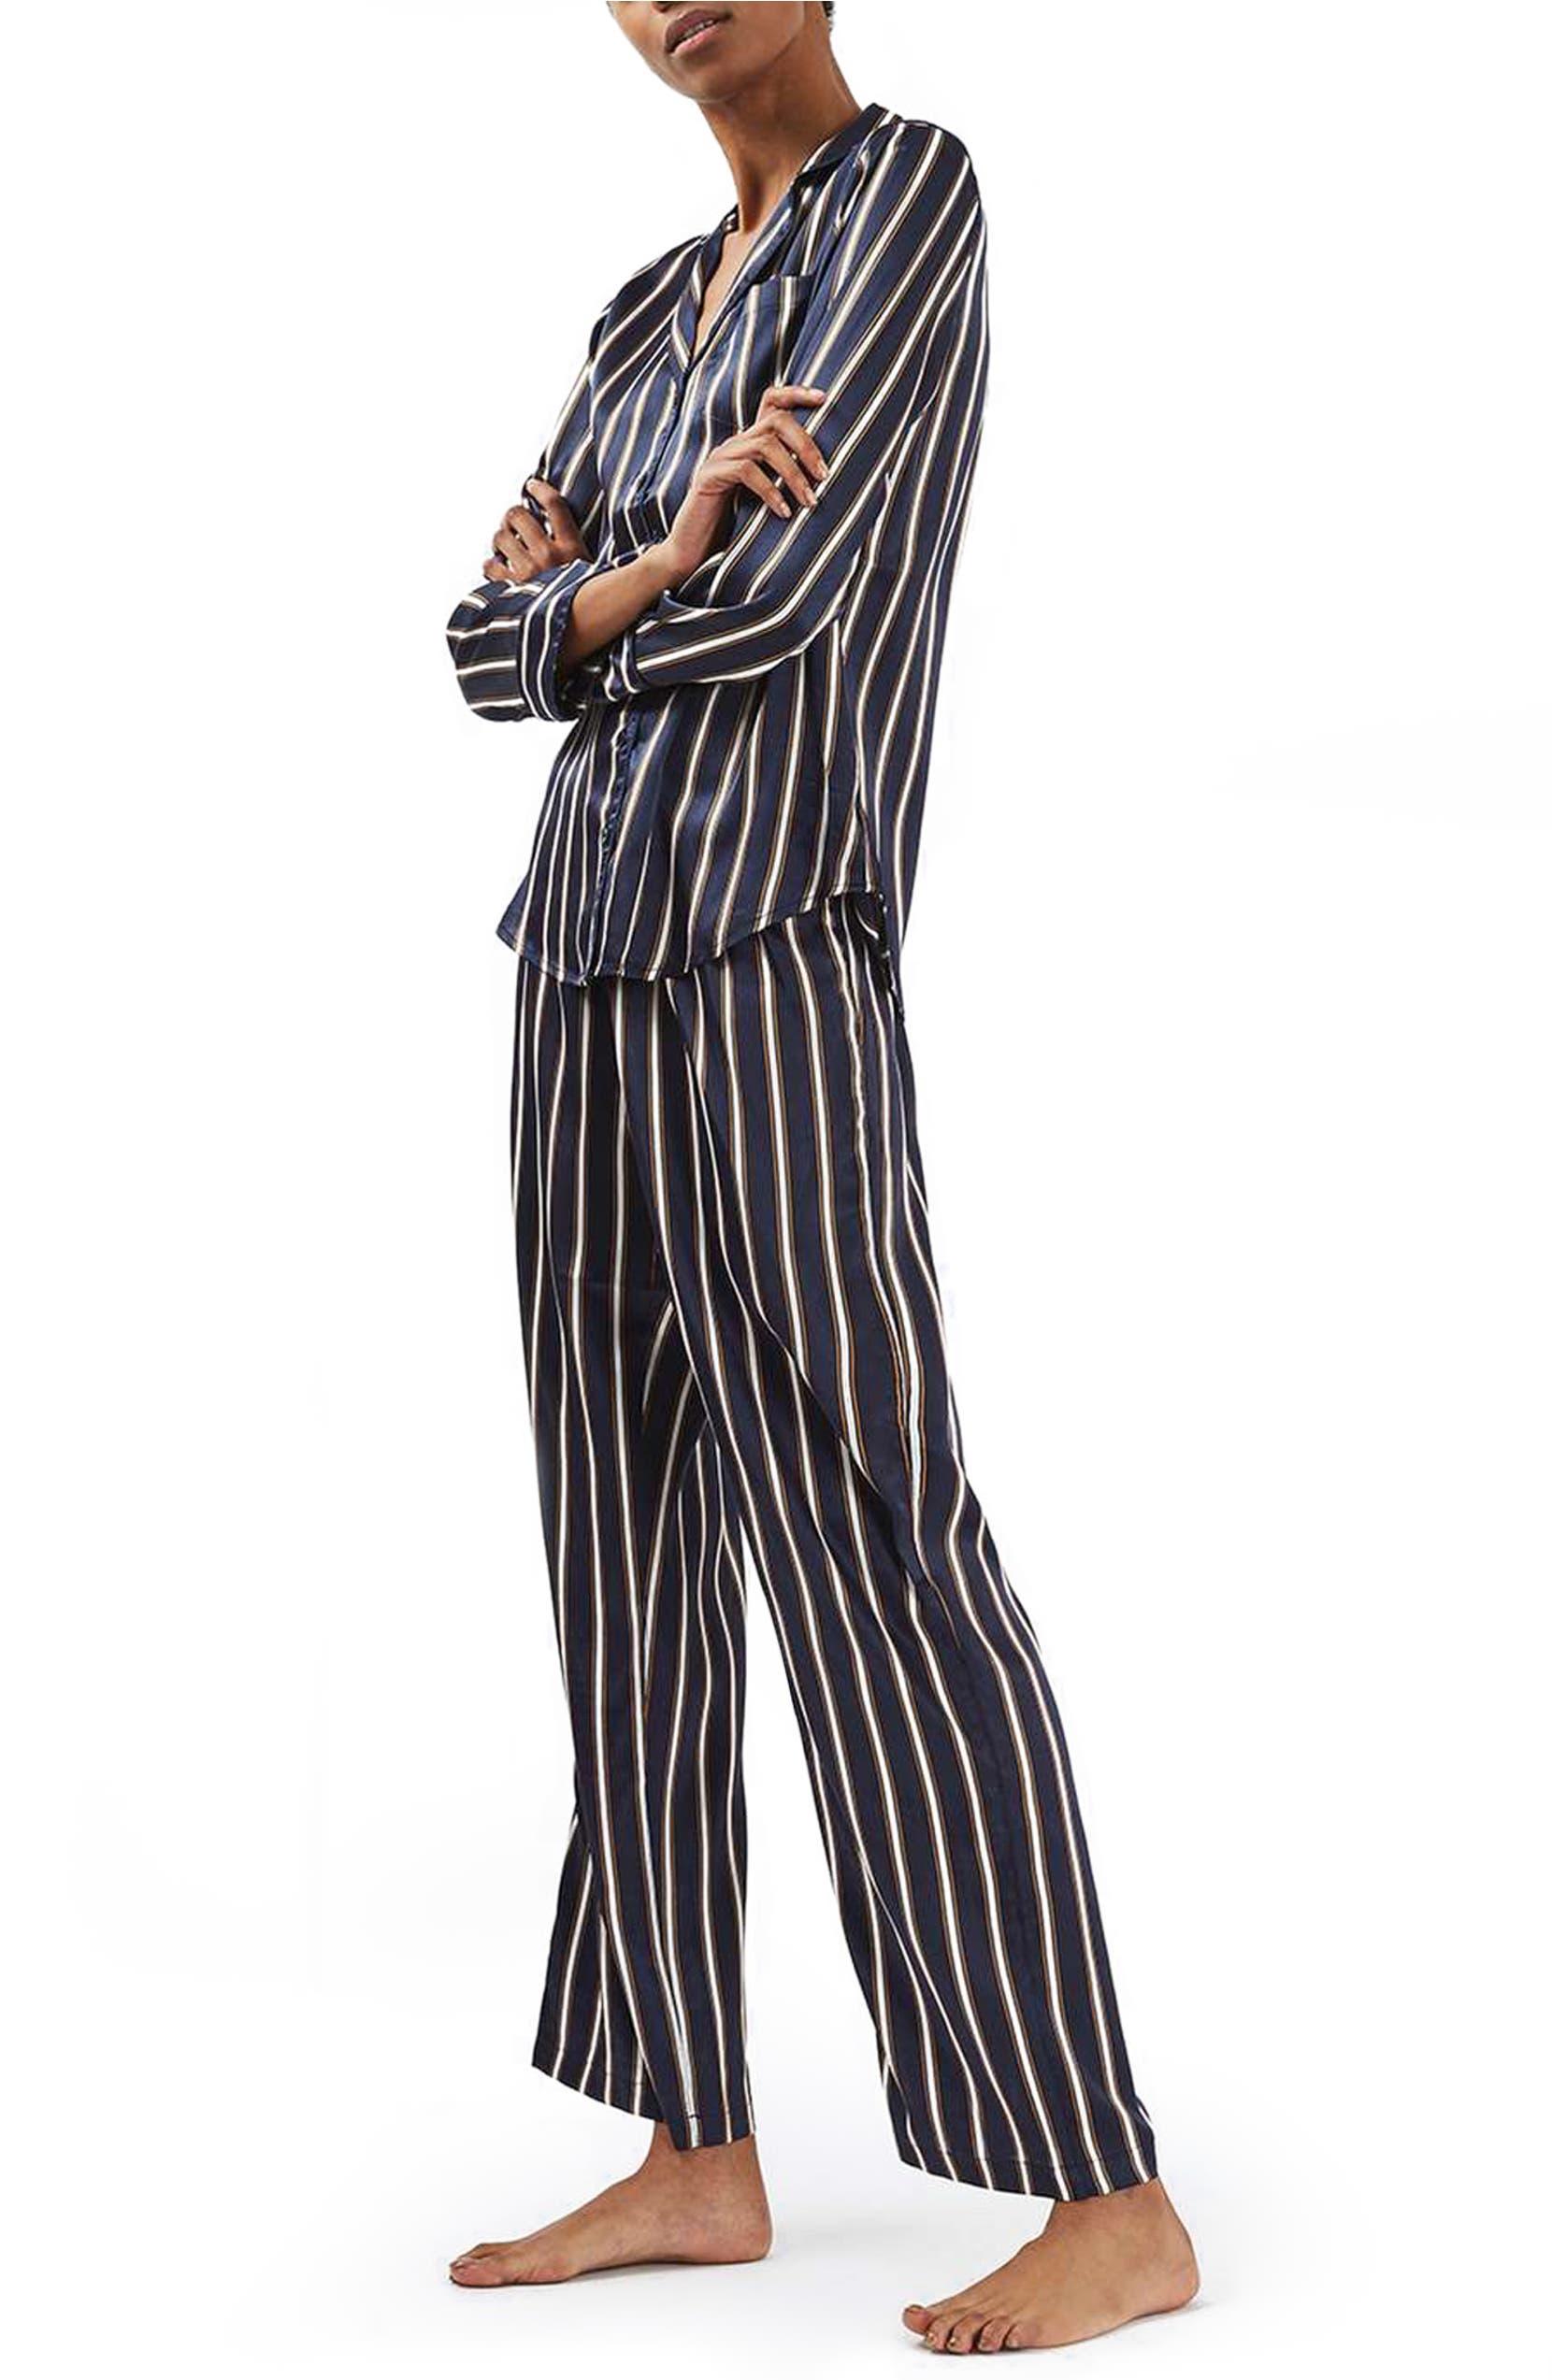 Topshop Satin Pajamas  ed7e0ee83